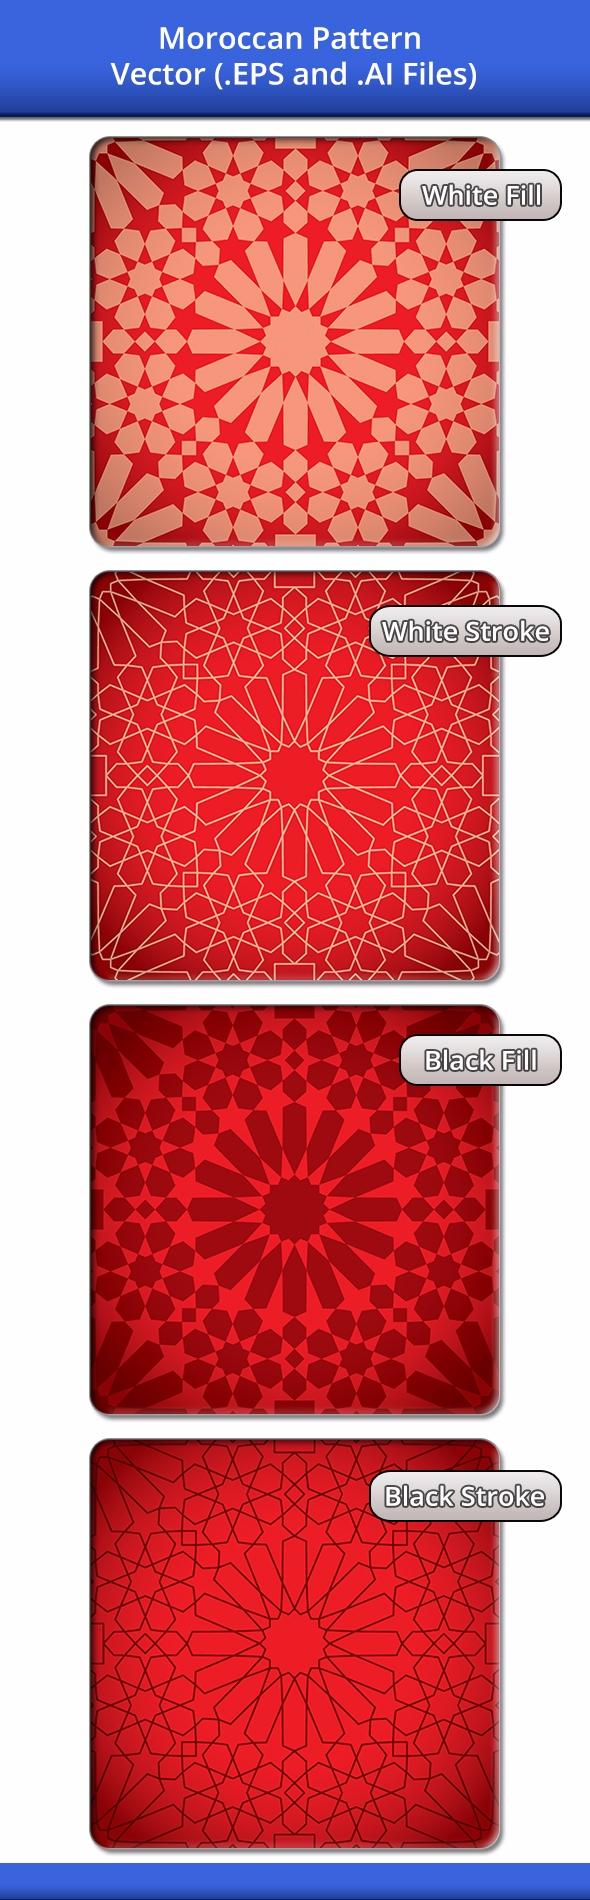 Moroccan Pattern, vector drawin - dinoart | ello